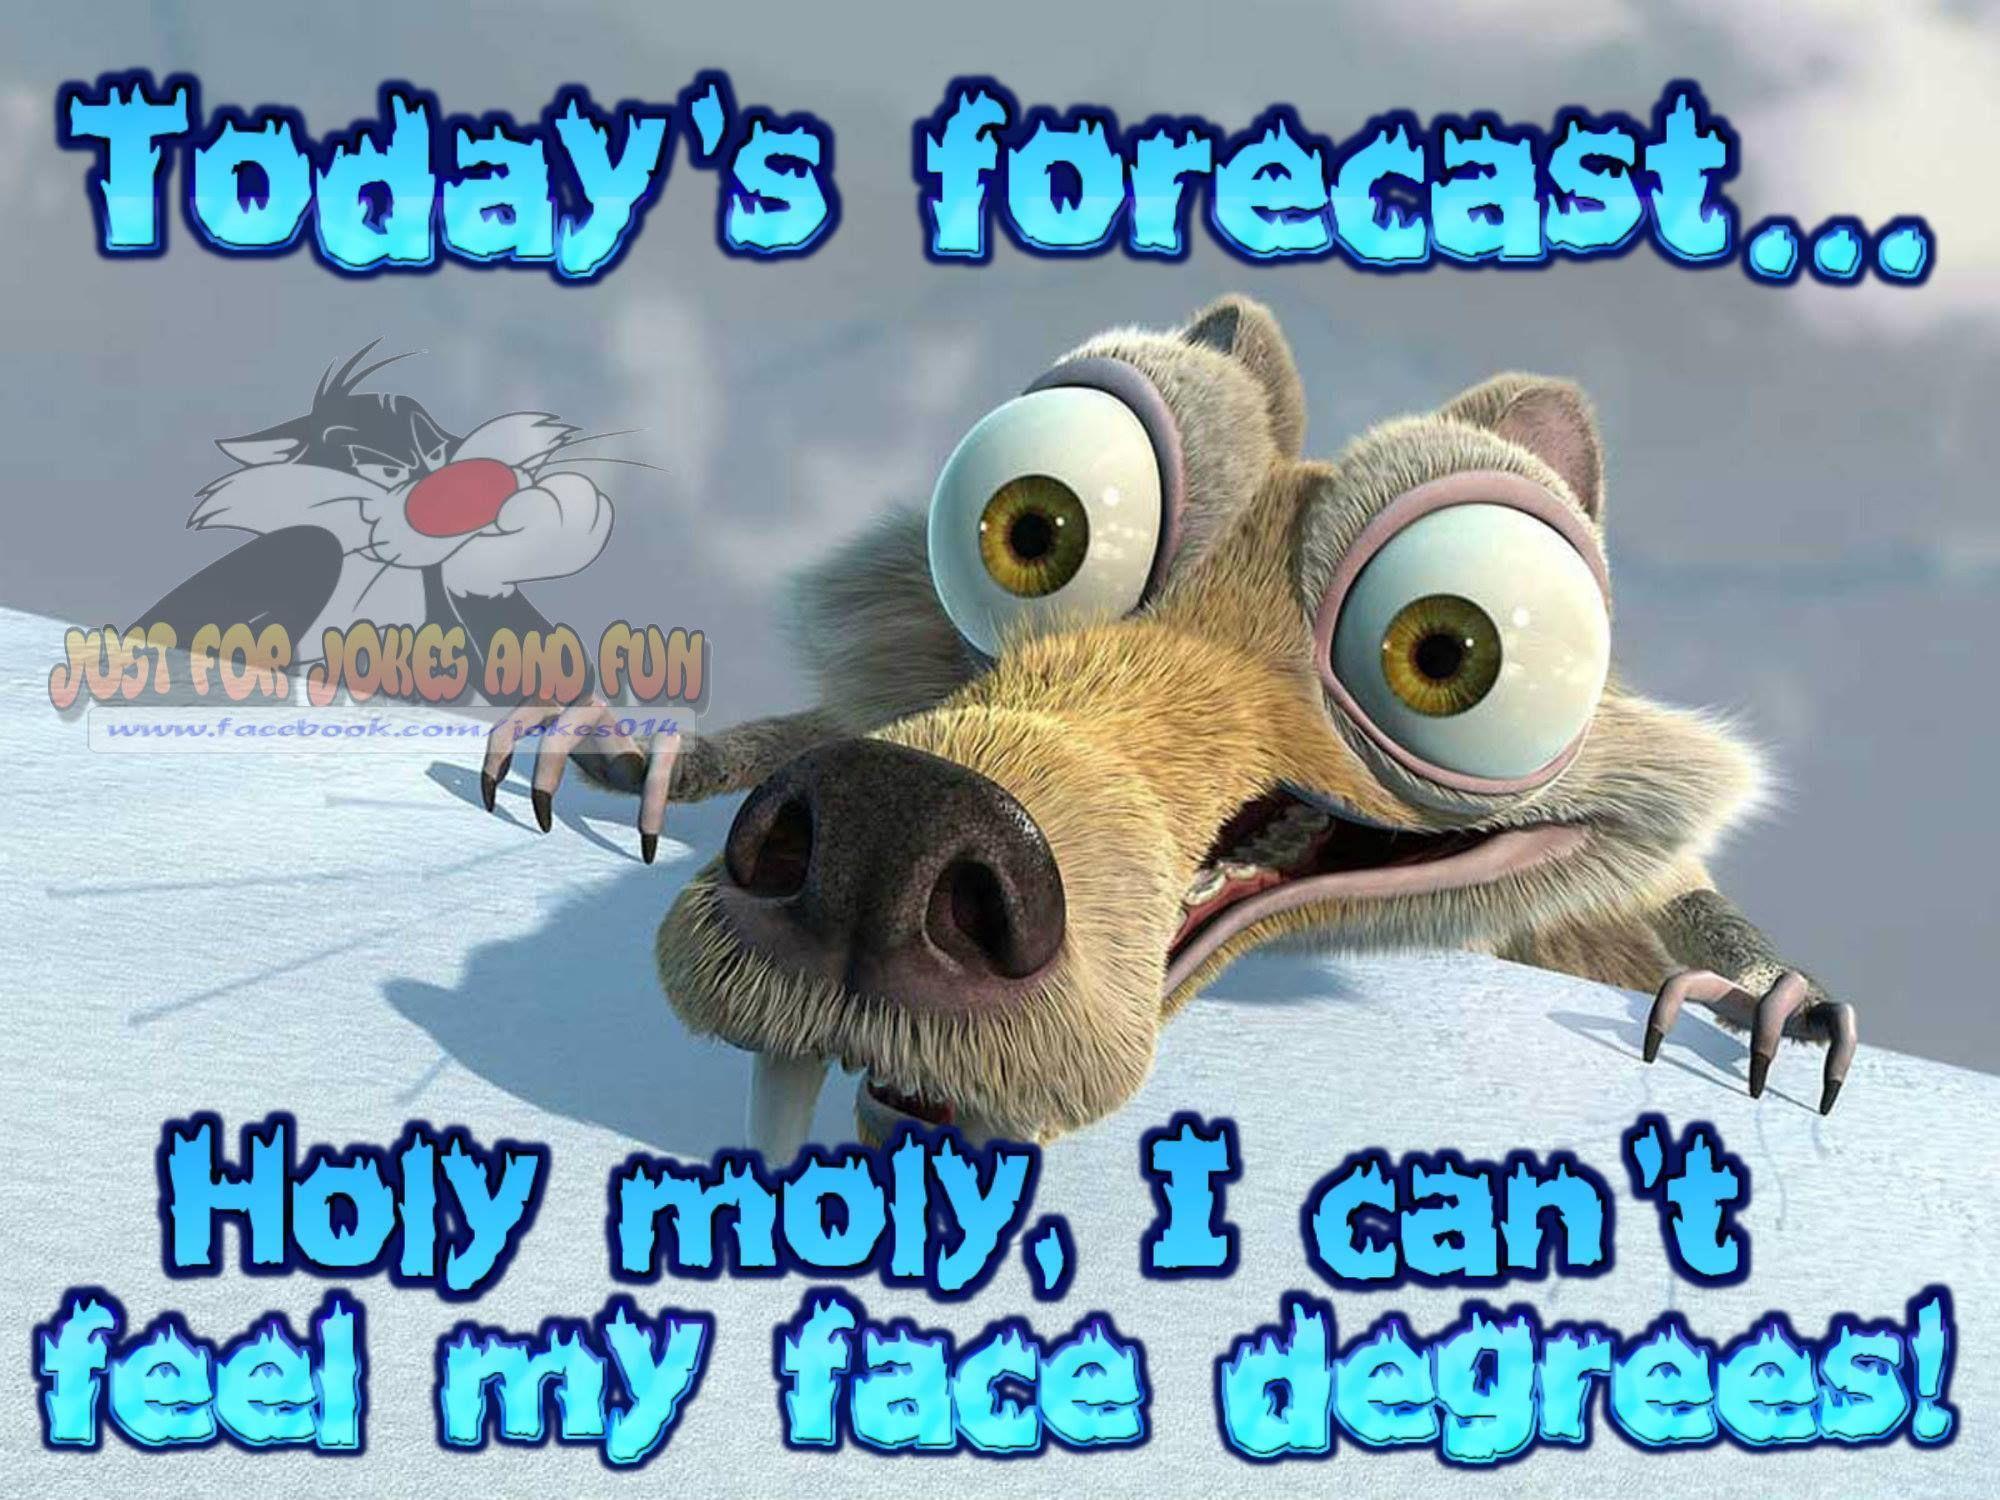 Todays Forecast Holy Crap I Cant Feel My Face Degrees Kicks